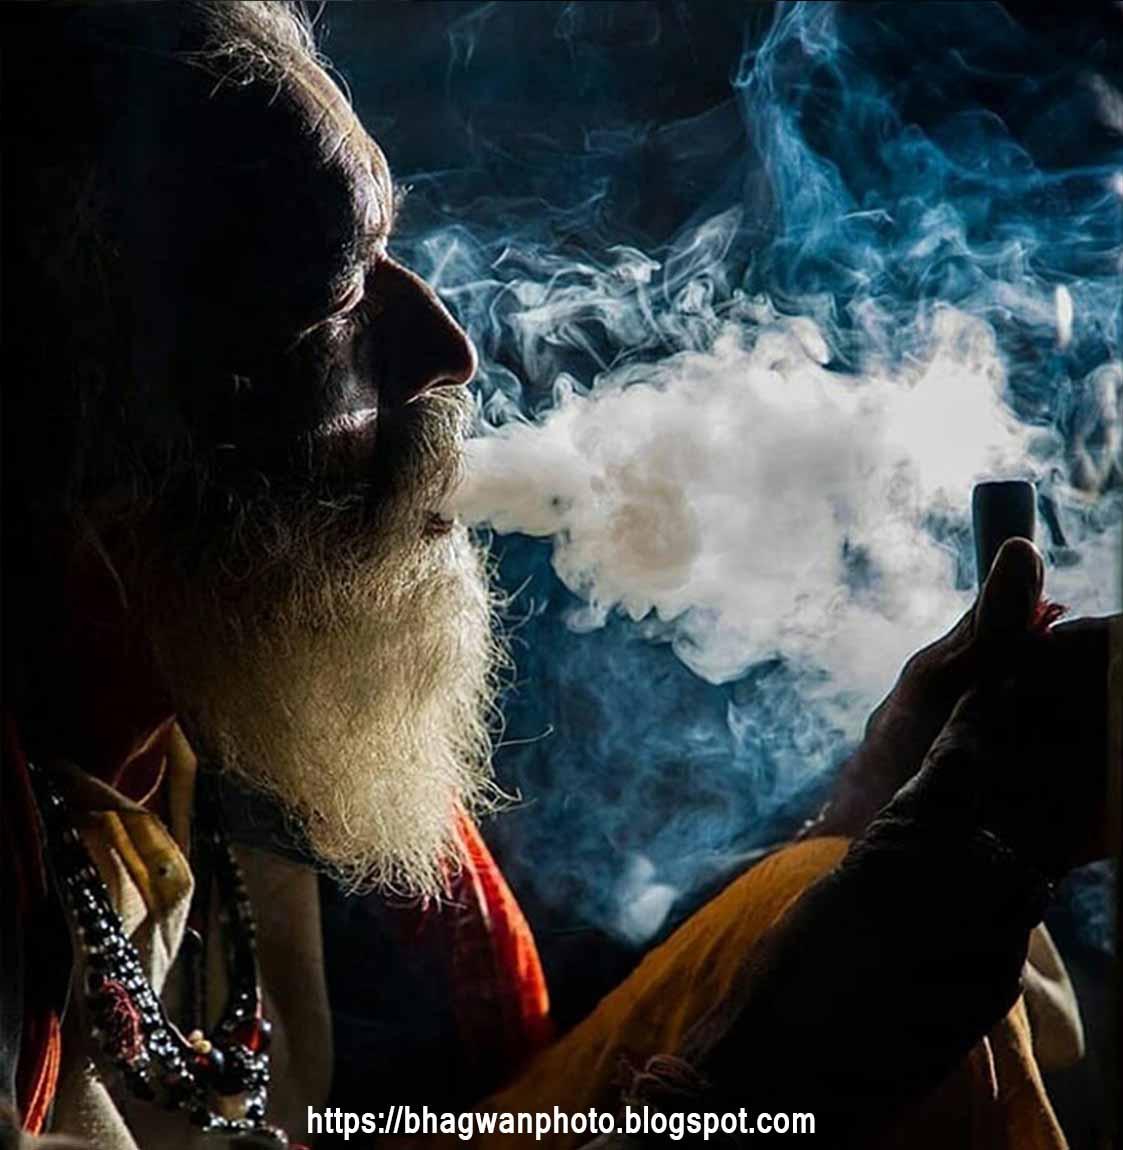 Mahadev Bhakt Jay Mahakal S4l Har Har Mahadev 2019 Day 9 Mahadev Status Jay Pin By Devjibhai Padaya On Jay Bhole Shiva Lord